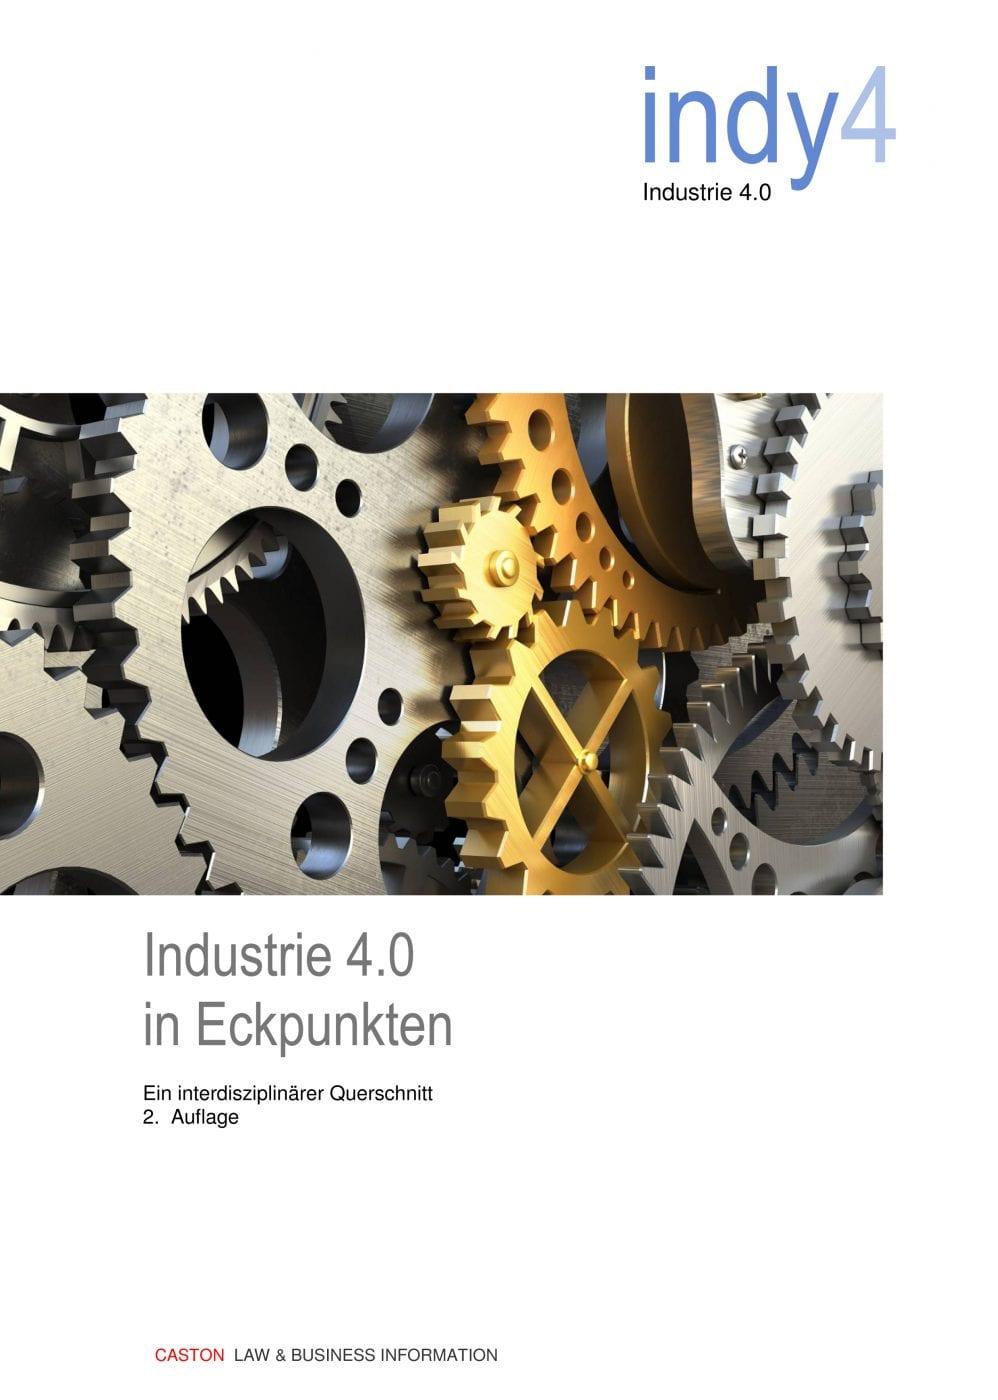 Indy4-Industrie 4-0 Eckpunkte 2-Aufl _E160115_